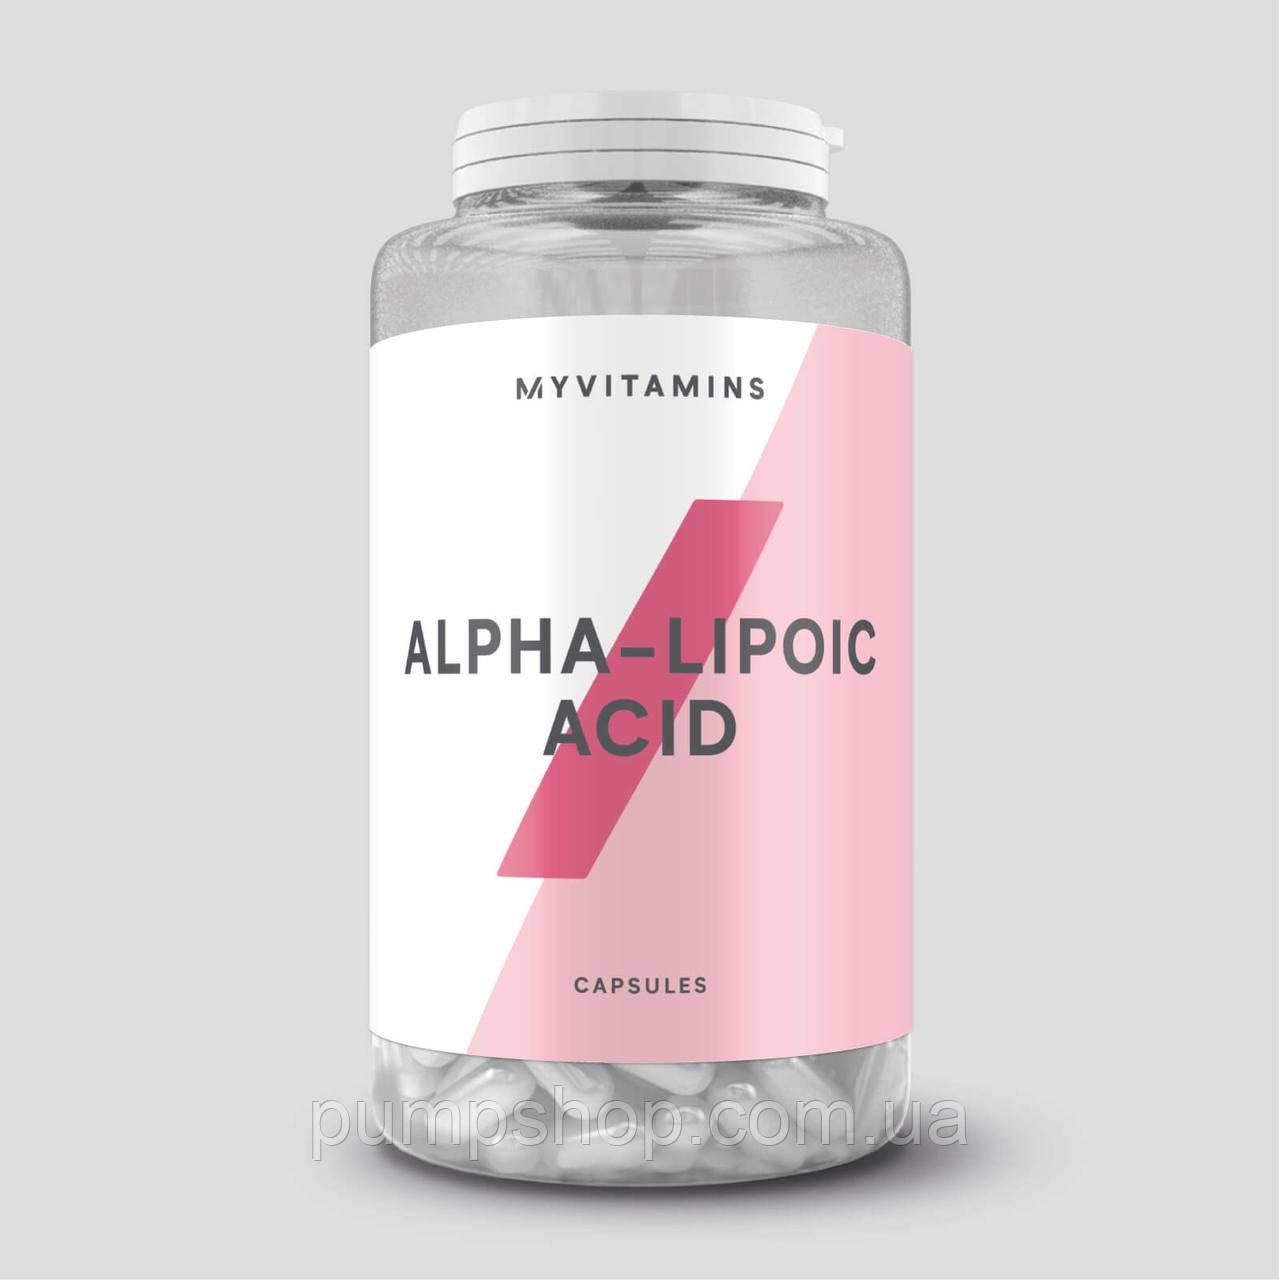 Альфа-ліпоєва кислота Myprotein Myvitamins Alpha Lipoic Acid 500 мг 60 капс.